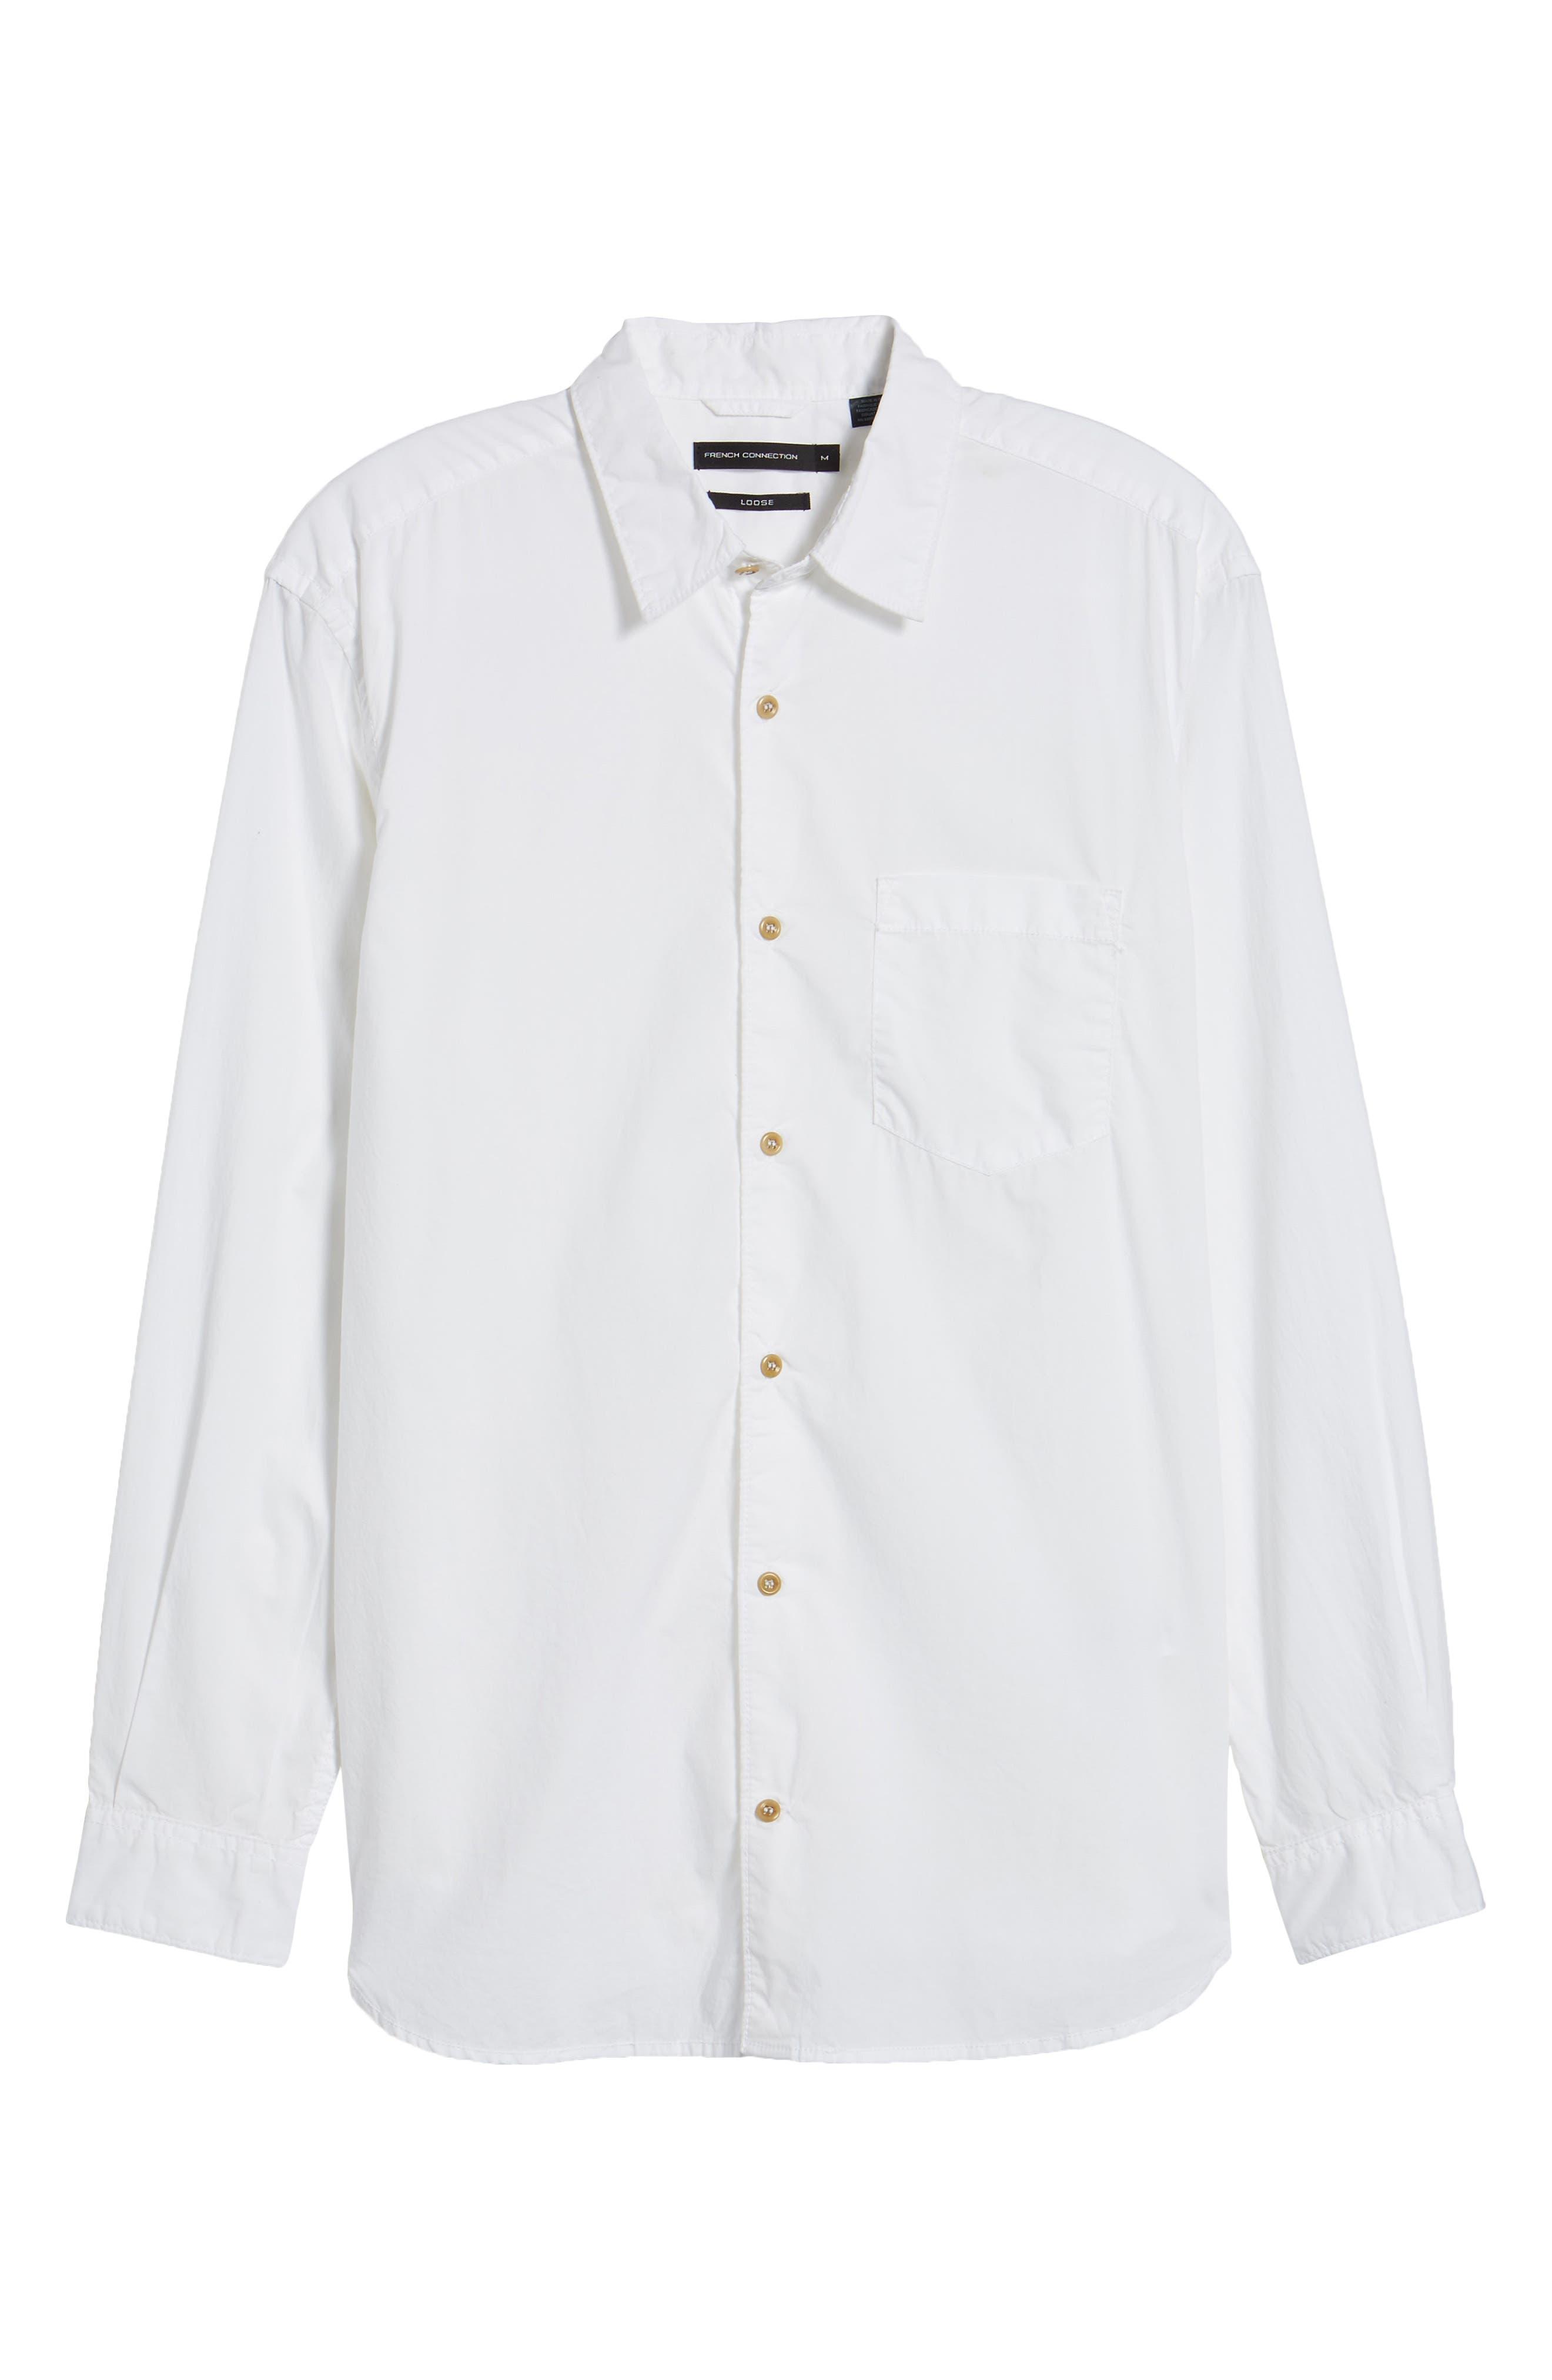 Regular Fit Poplin Sport Shirt,                             Alternate thumbnail 17, color,